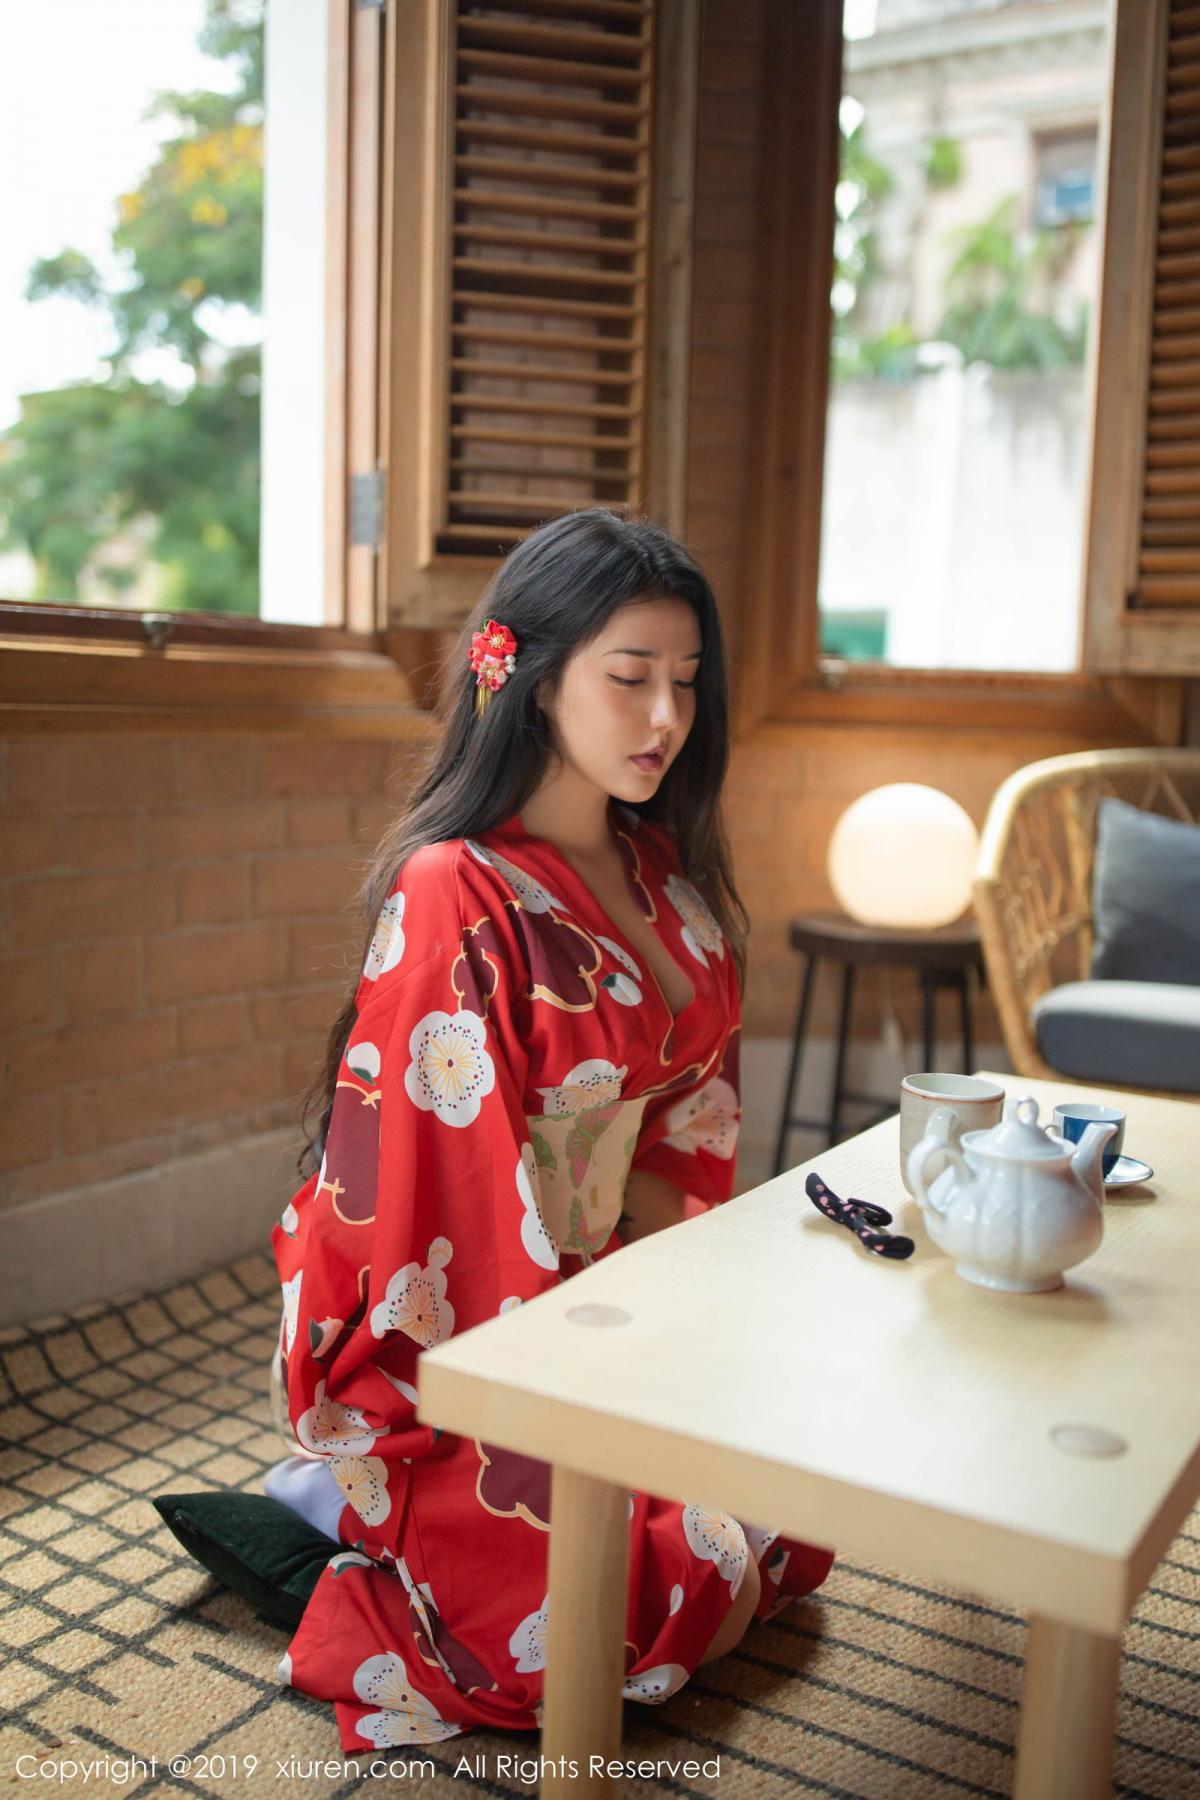 [XiuRen] Vol.1492 Ma Lu Na 1P, Adult, Kimono, Ma Lu Na, Xiuren